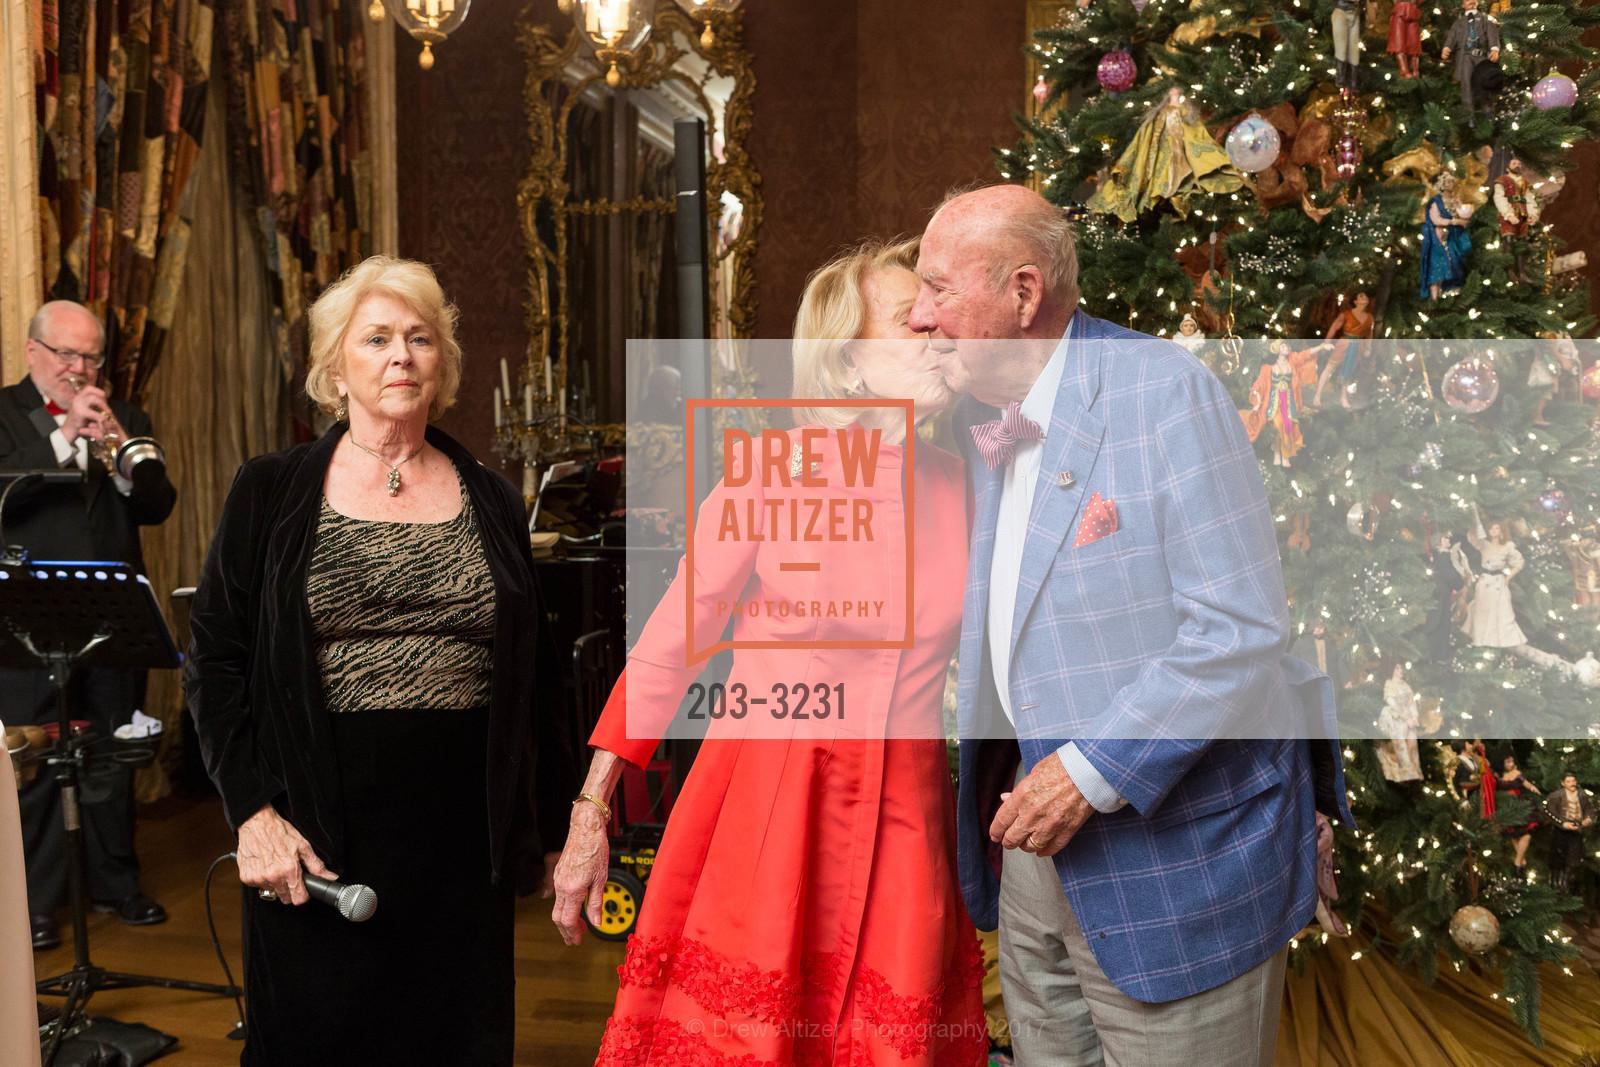 Marianne Kent, Charlotte Shultz, George Shultz, Photo #203-3231